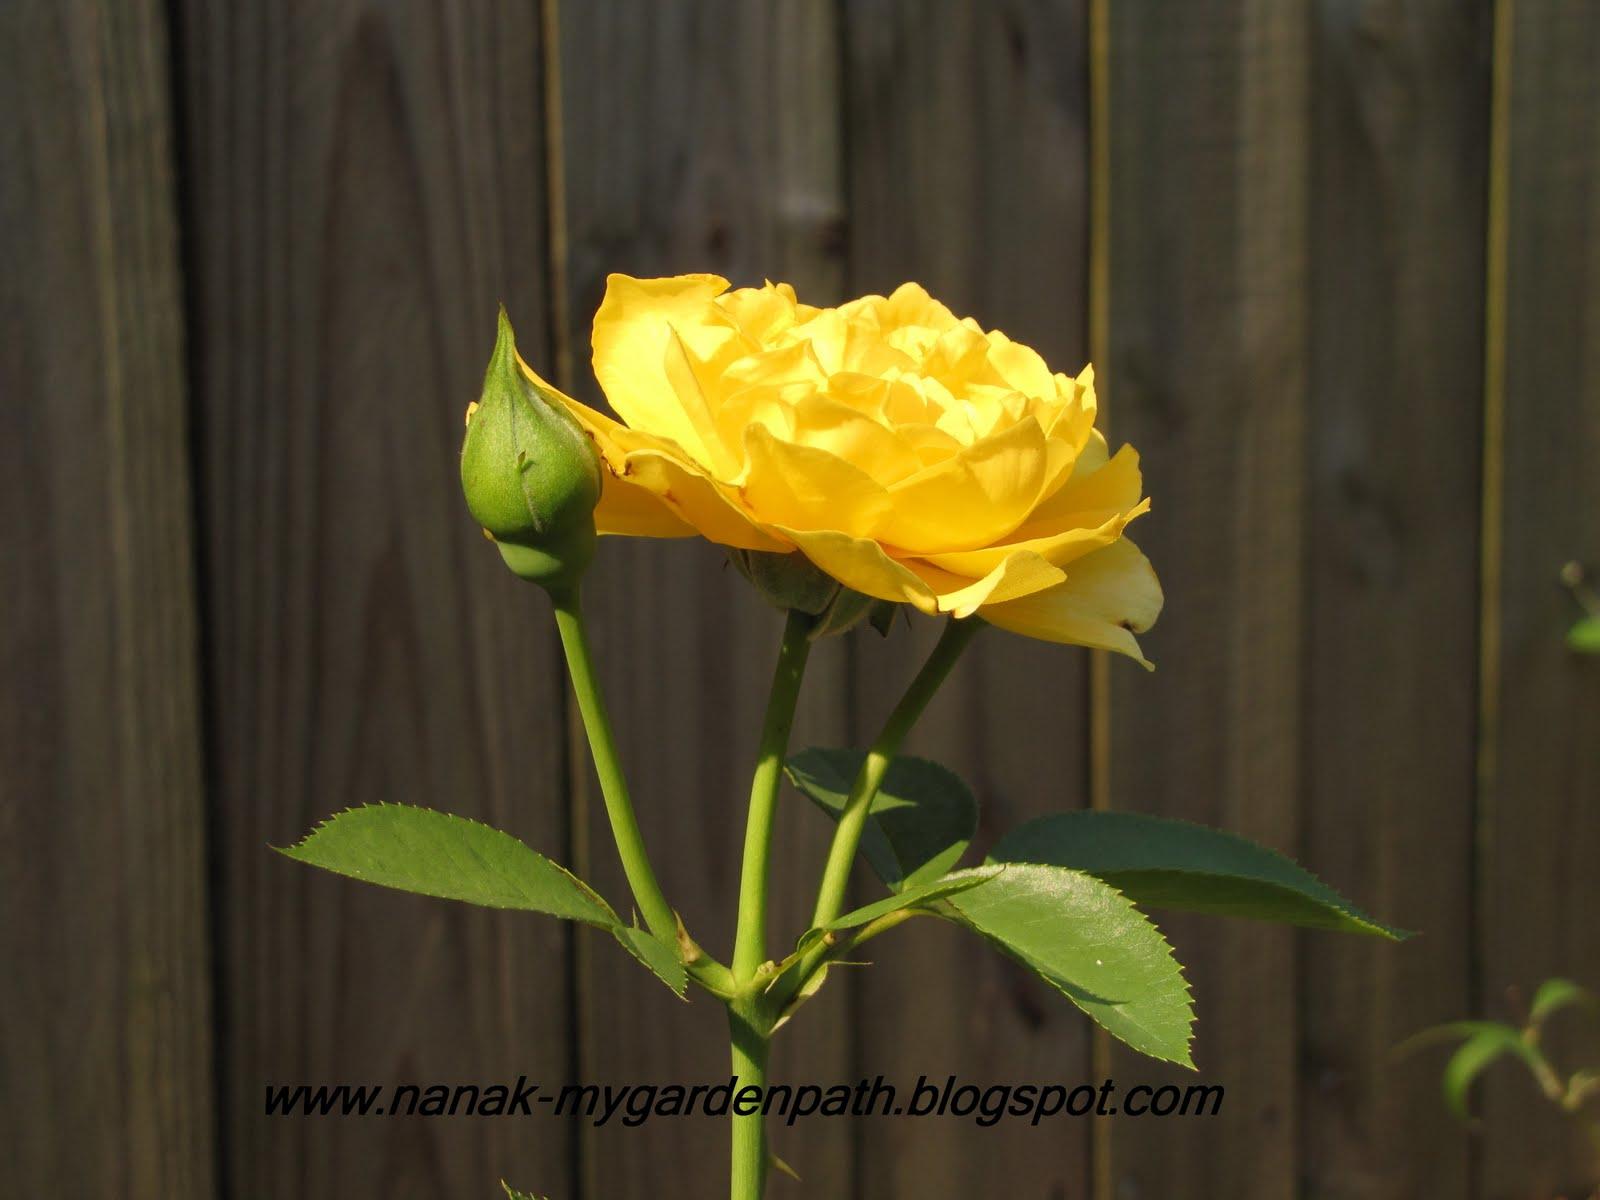 My Garden Path: Summer Roses